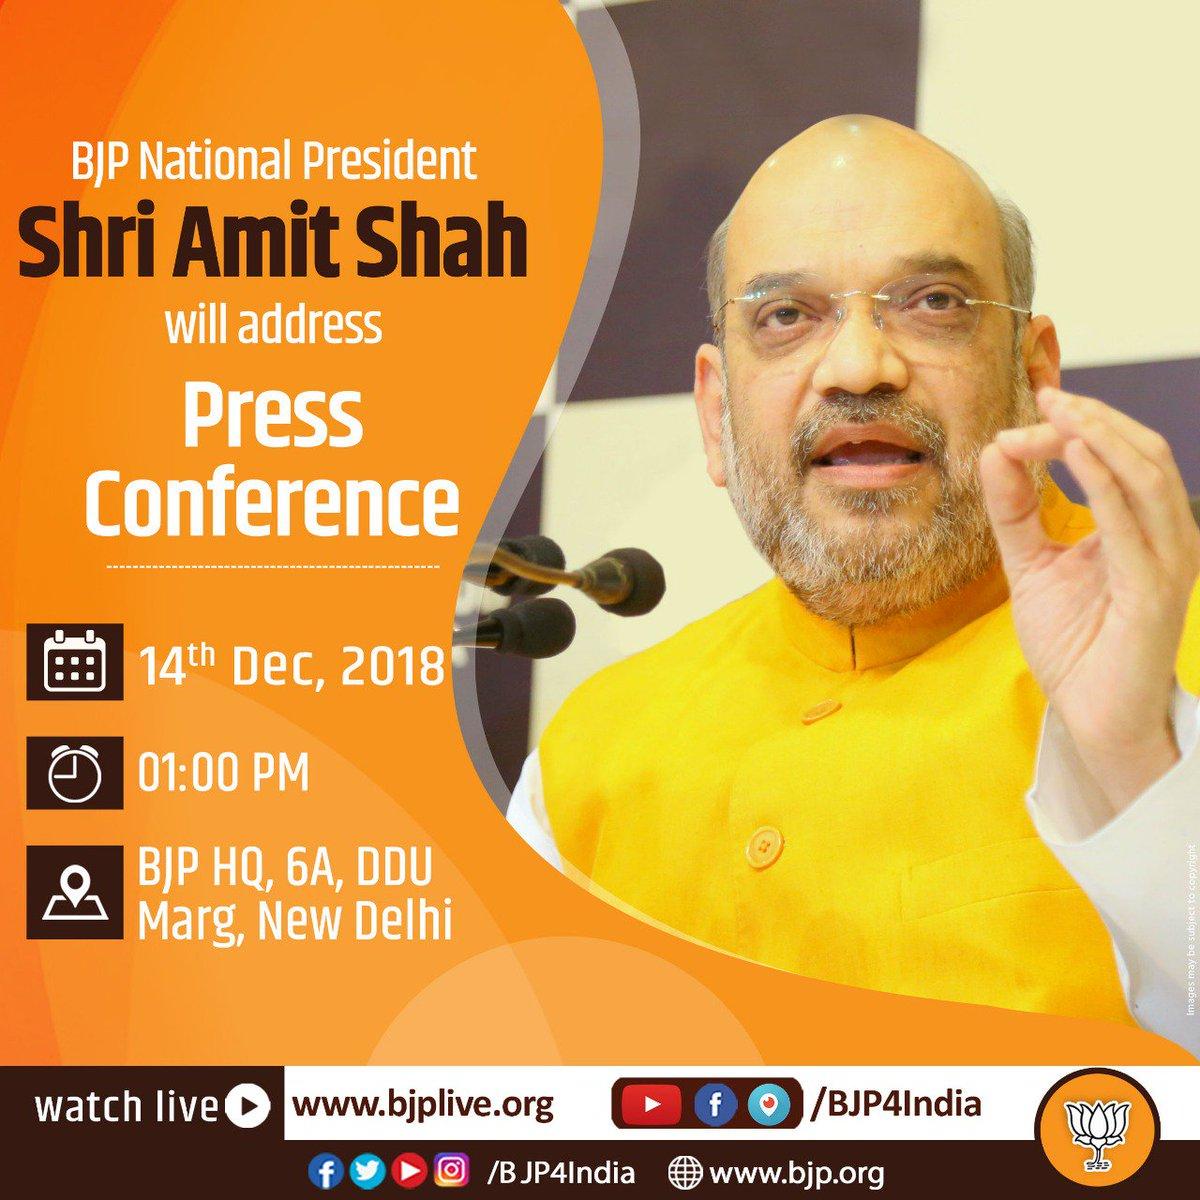 BJP National President Shri @AmitShah will address a Press conference today 1pm at BJP HQ, New Delhi. #SCNailsRaGaLies